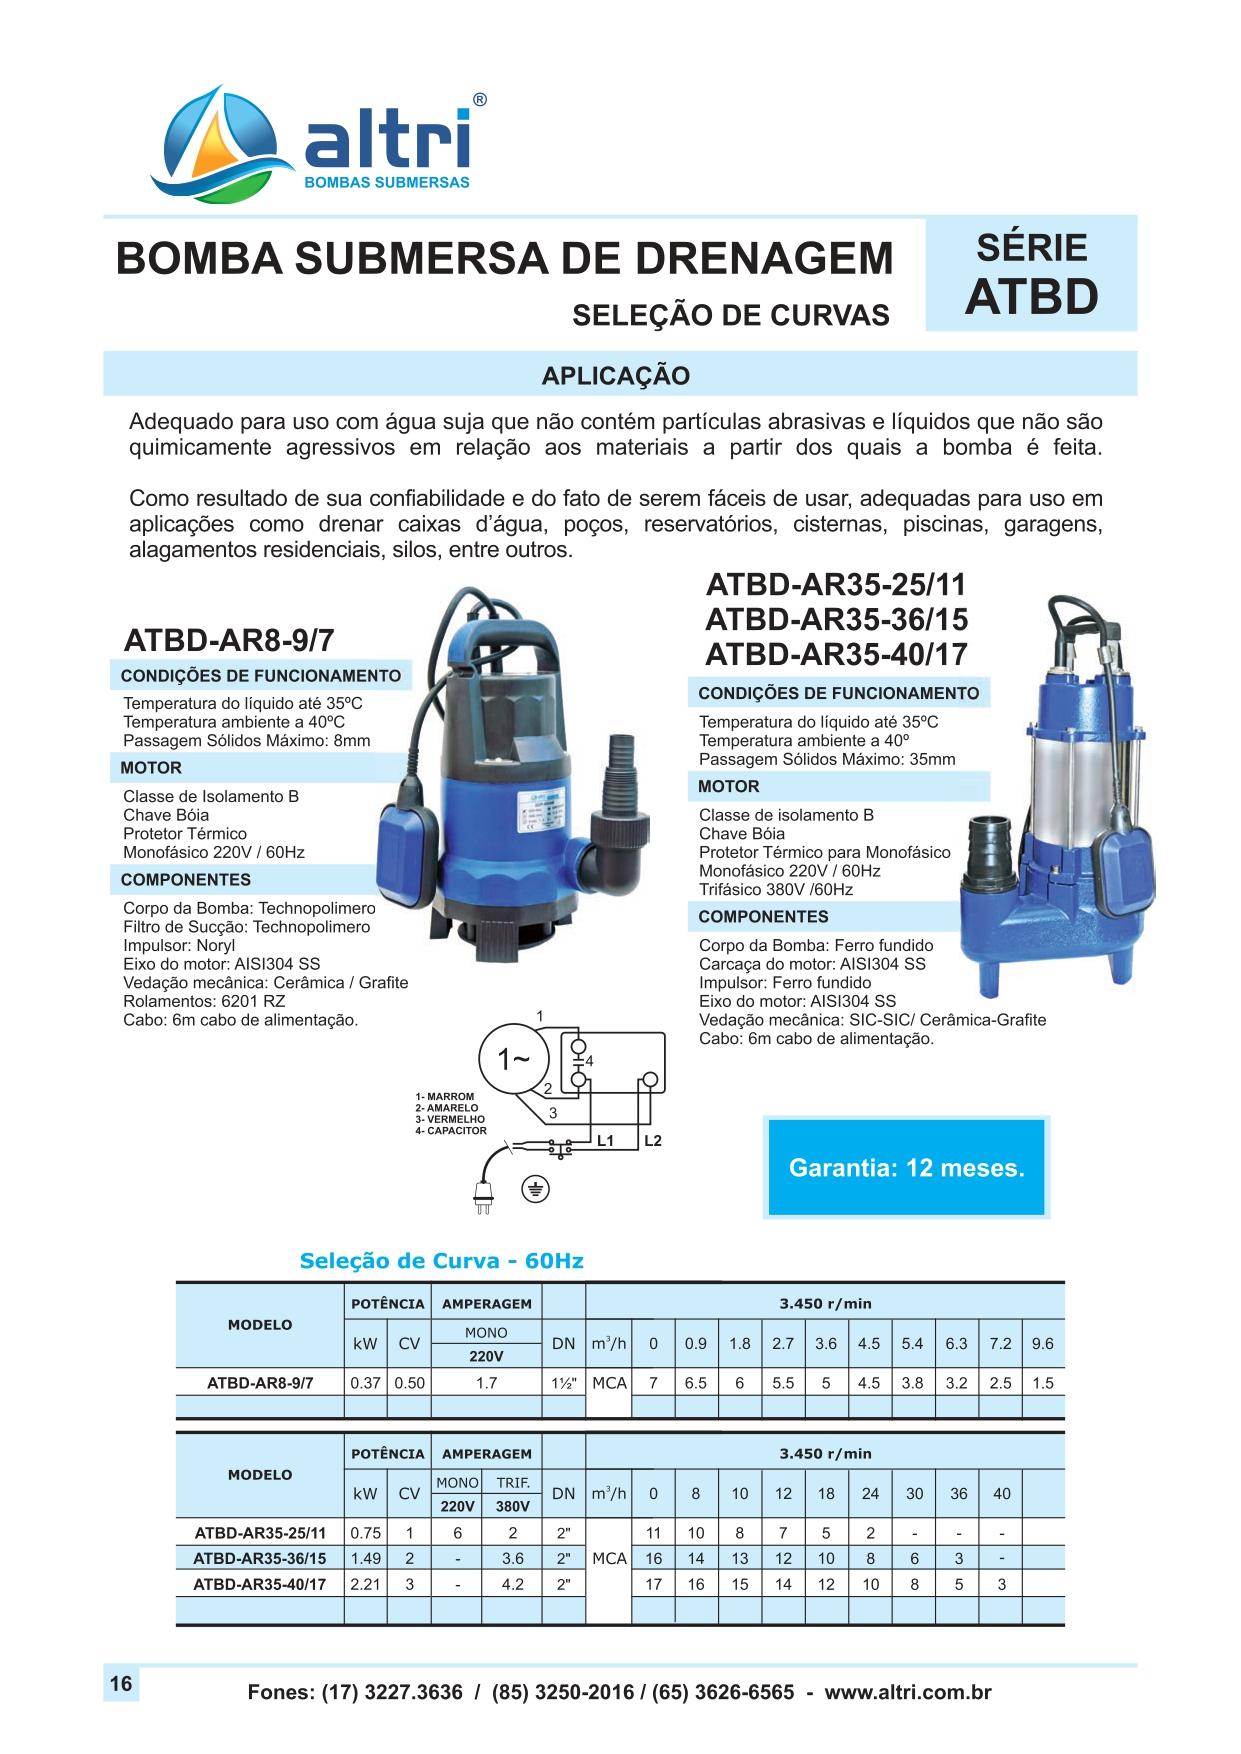 CATALOGO DE PRODUTOS ALTRI 2021 - WEB_page-0018